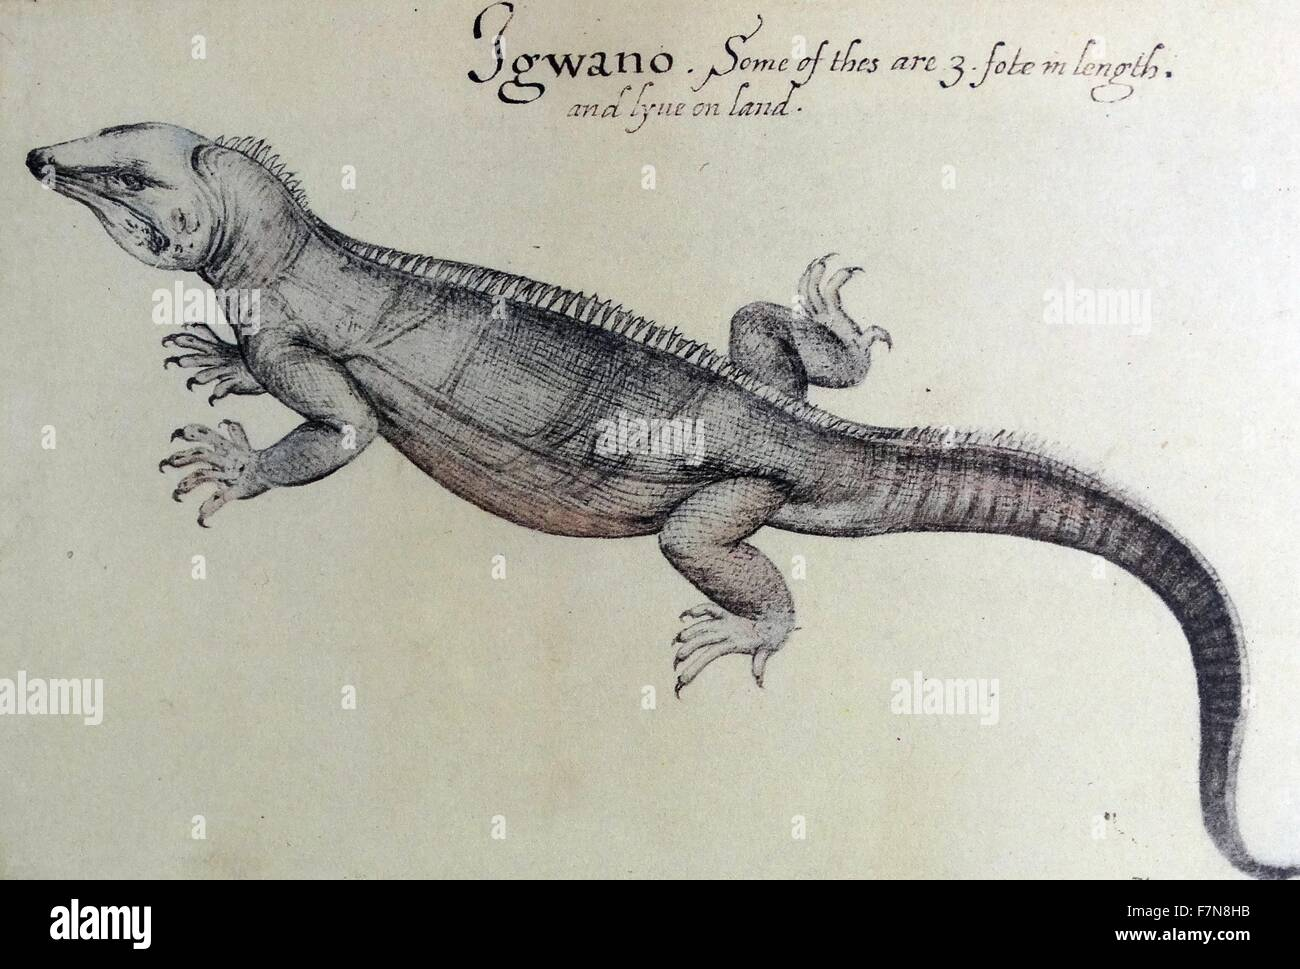 Acuarela de una iguana creado por John White (1585-1586). Imagen De Stock